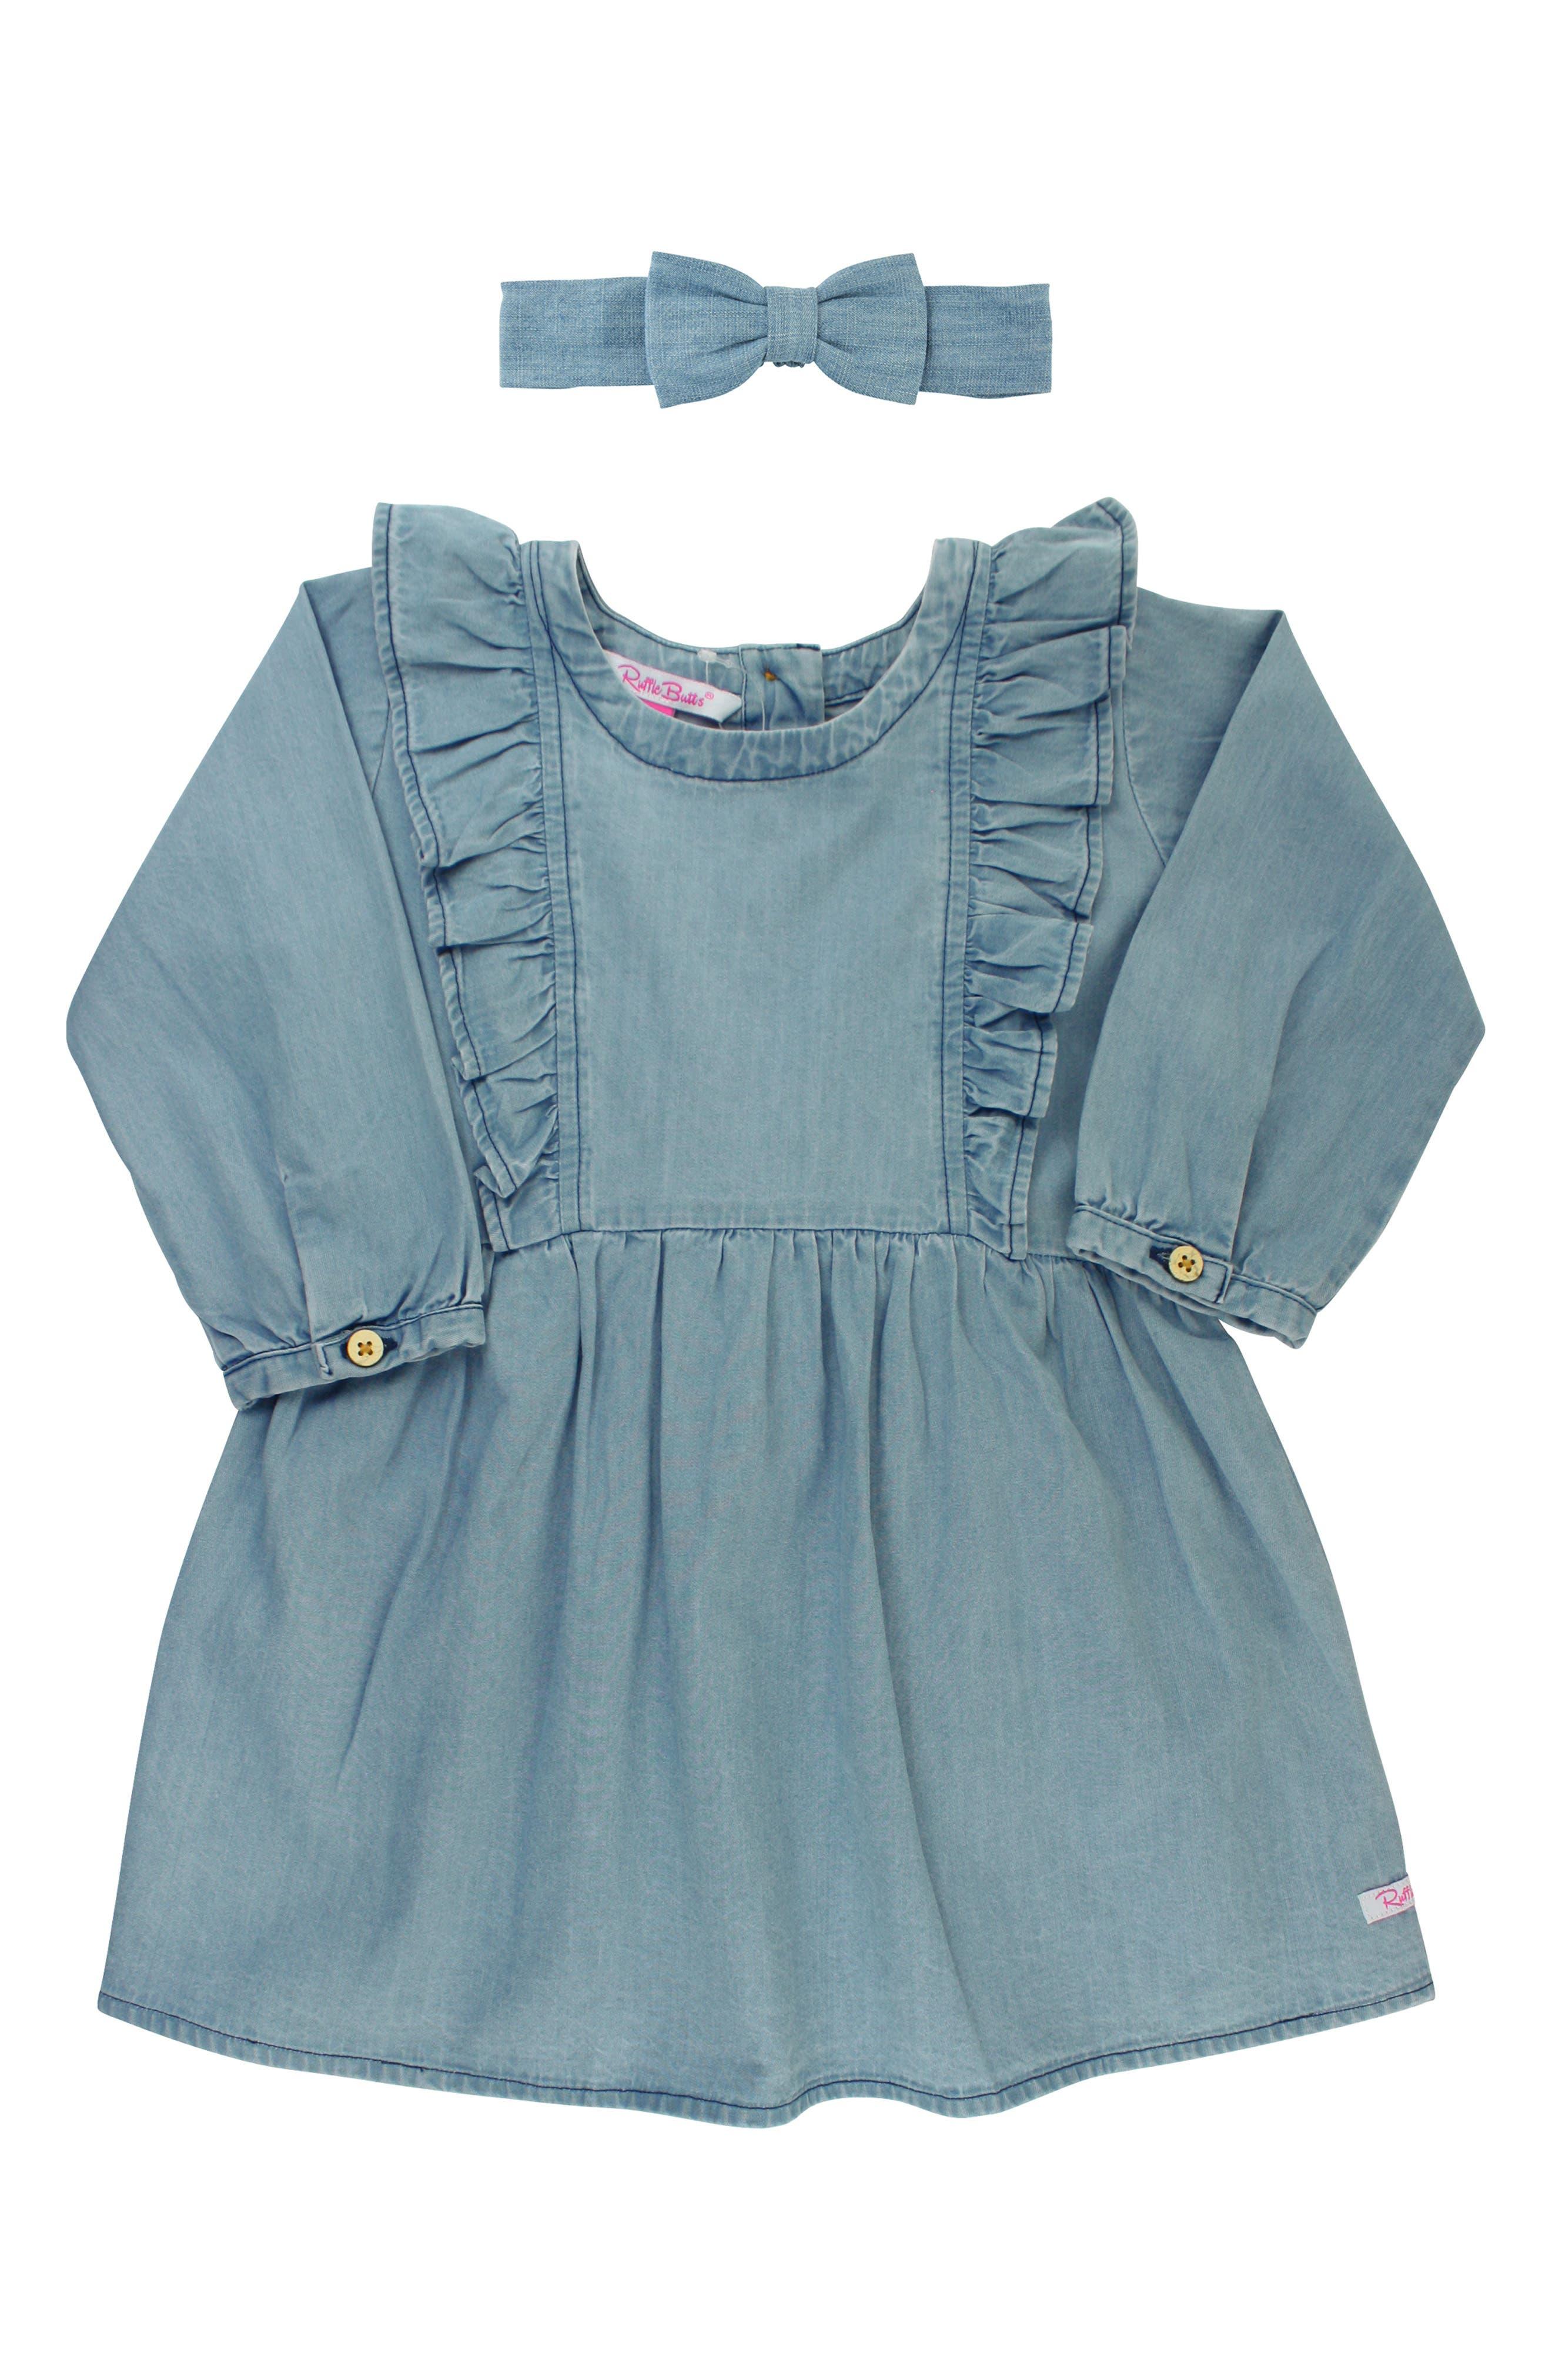 RUFFLEBUTTS,                             Cotton Chambray Dress & Headband Set,                             Main thumbnail 1, color,                             BLUE